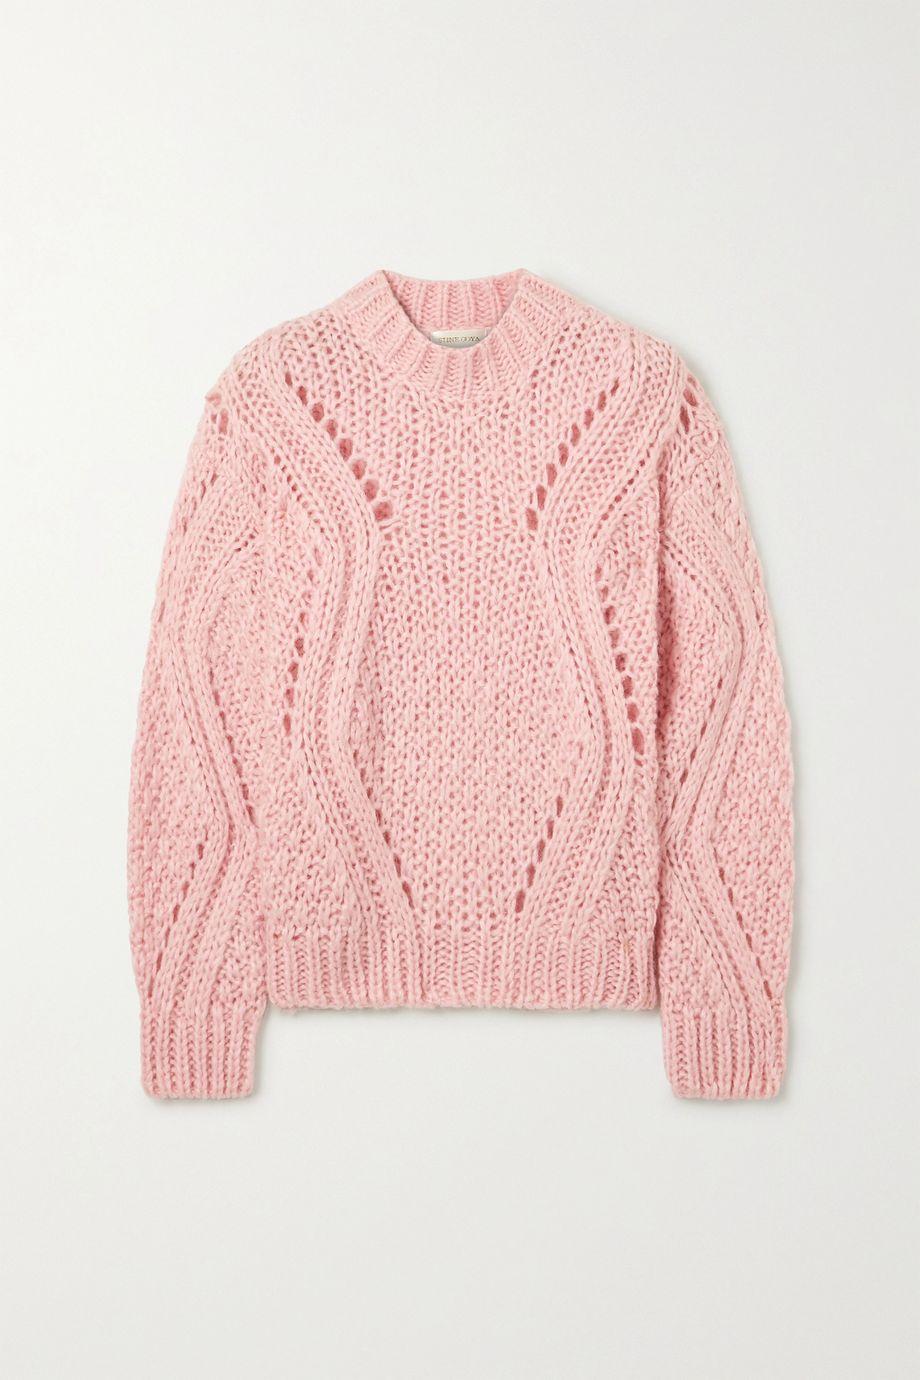 Stine Goya Alex cable-knit sweater